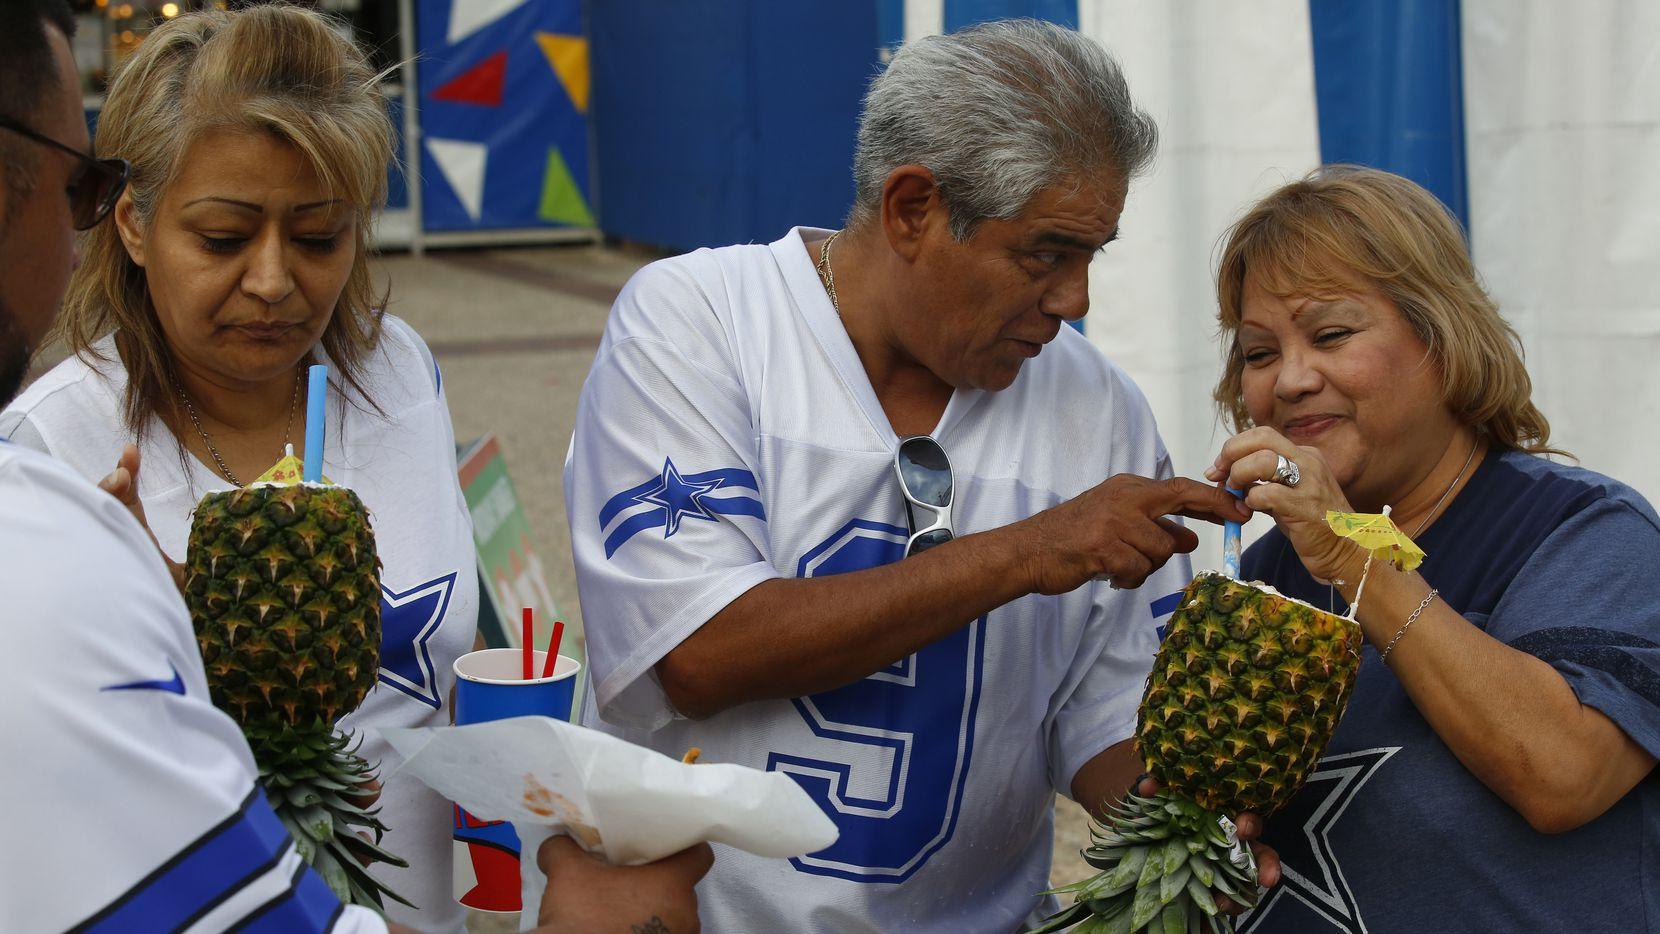 In this 2014 file photo, Roberto Aguilar (left to right) Lydia Aguilar, Ralph Delgado and Mary Delgado enjoy Pina Colada Smoothies at the State Fair of Texas.